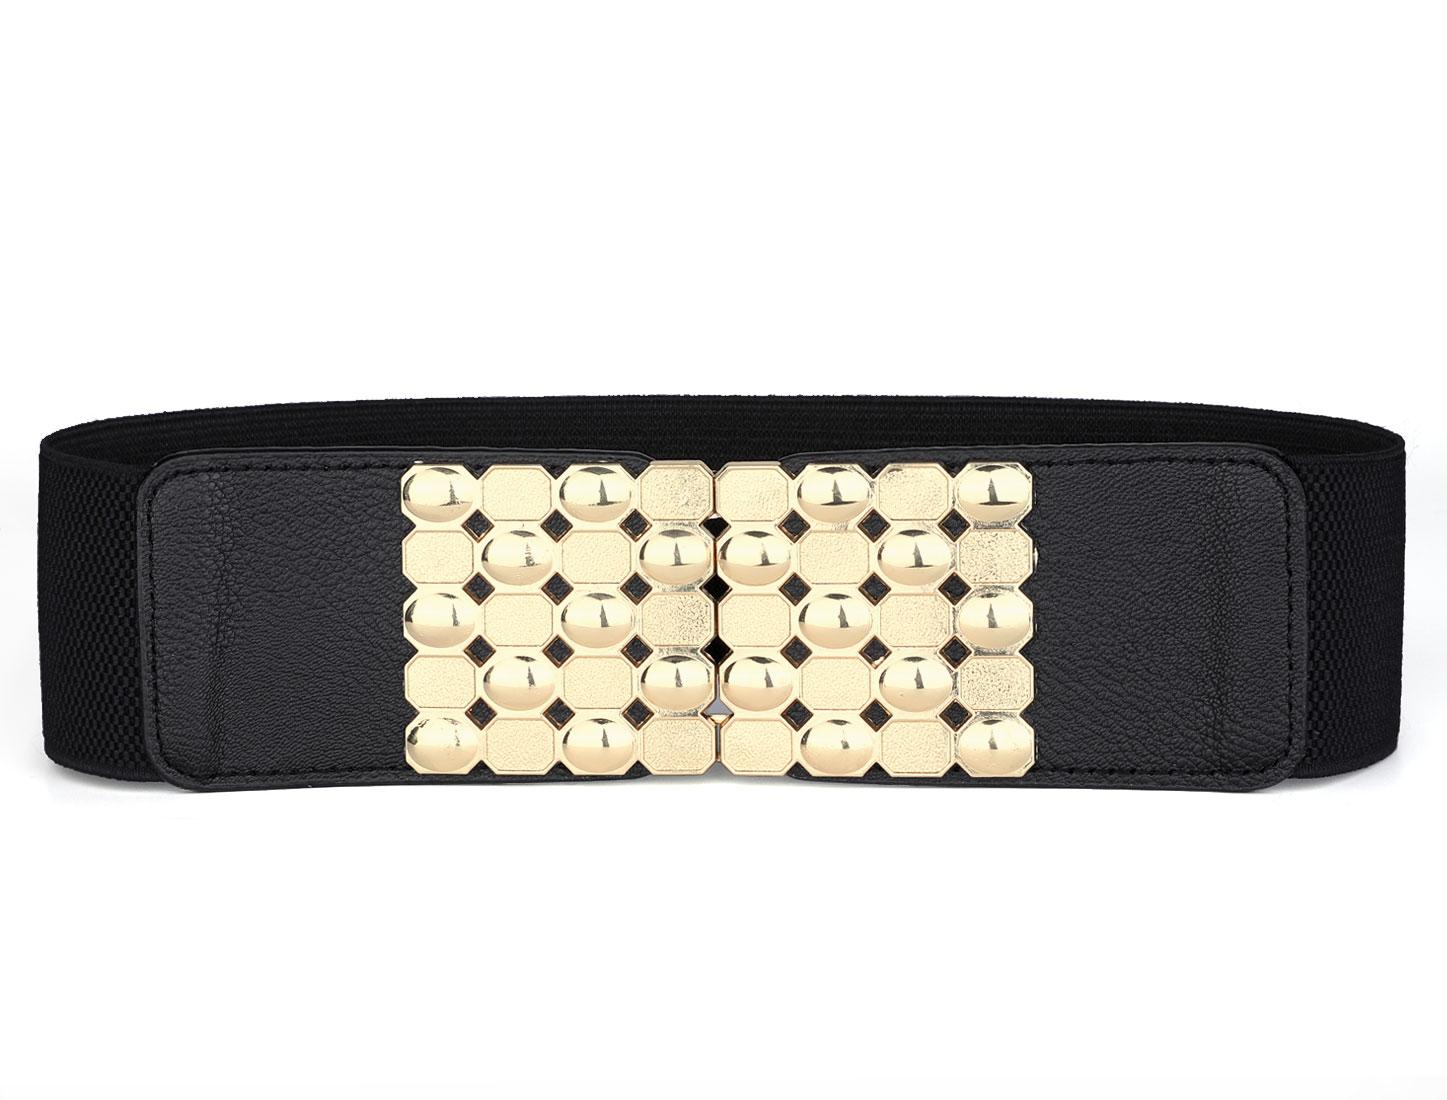 Lady Interlocking Buckle Geometric Metal Decor Waist Belt Black